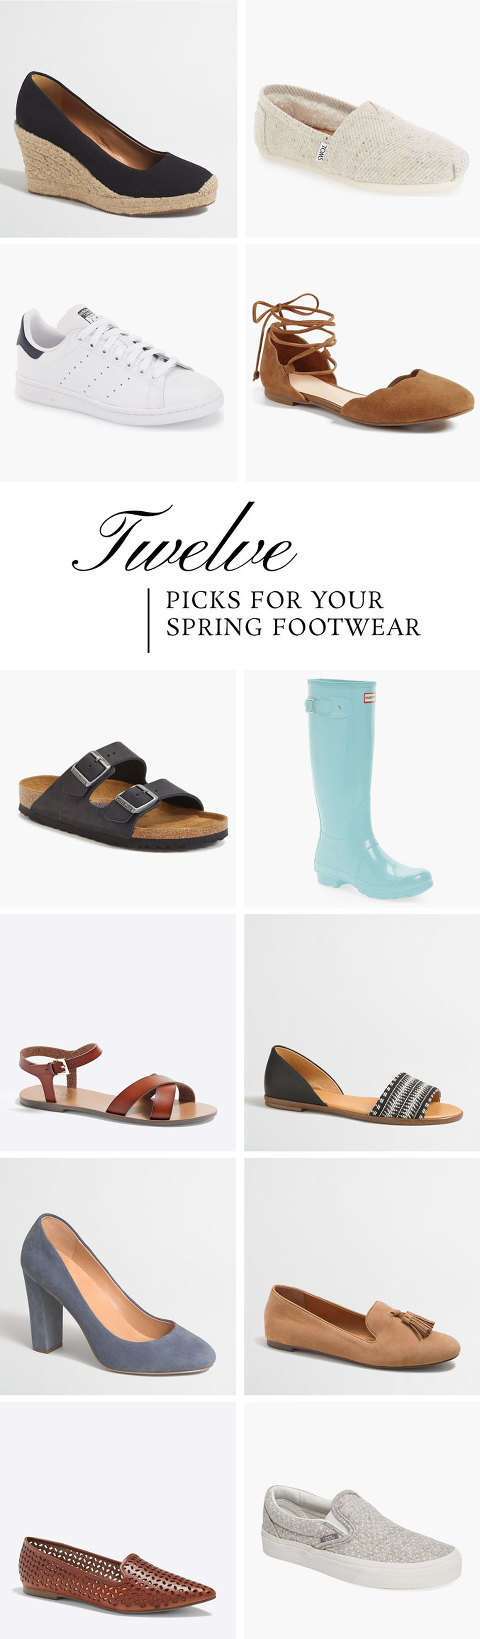 http://www.dreamgreendiy.com/wp-content/uploads/2017/03/02-40499-post/Dozen-Spring-Footwear(pp_w480_h1639).jpg